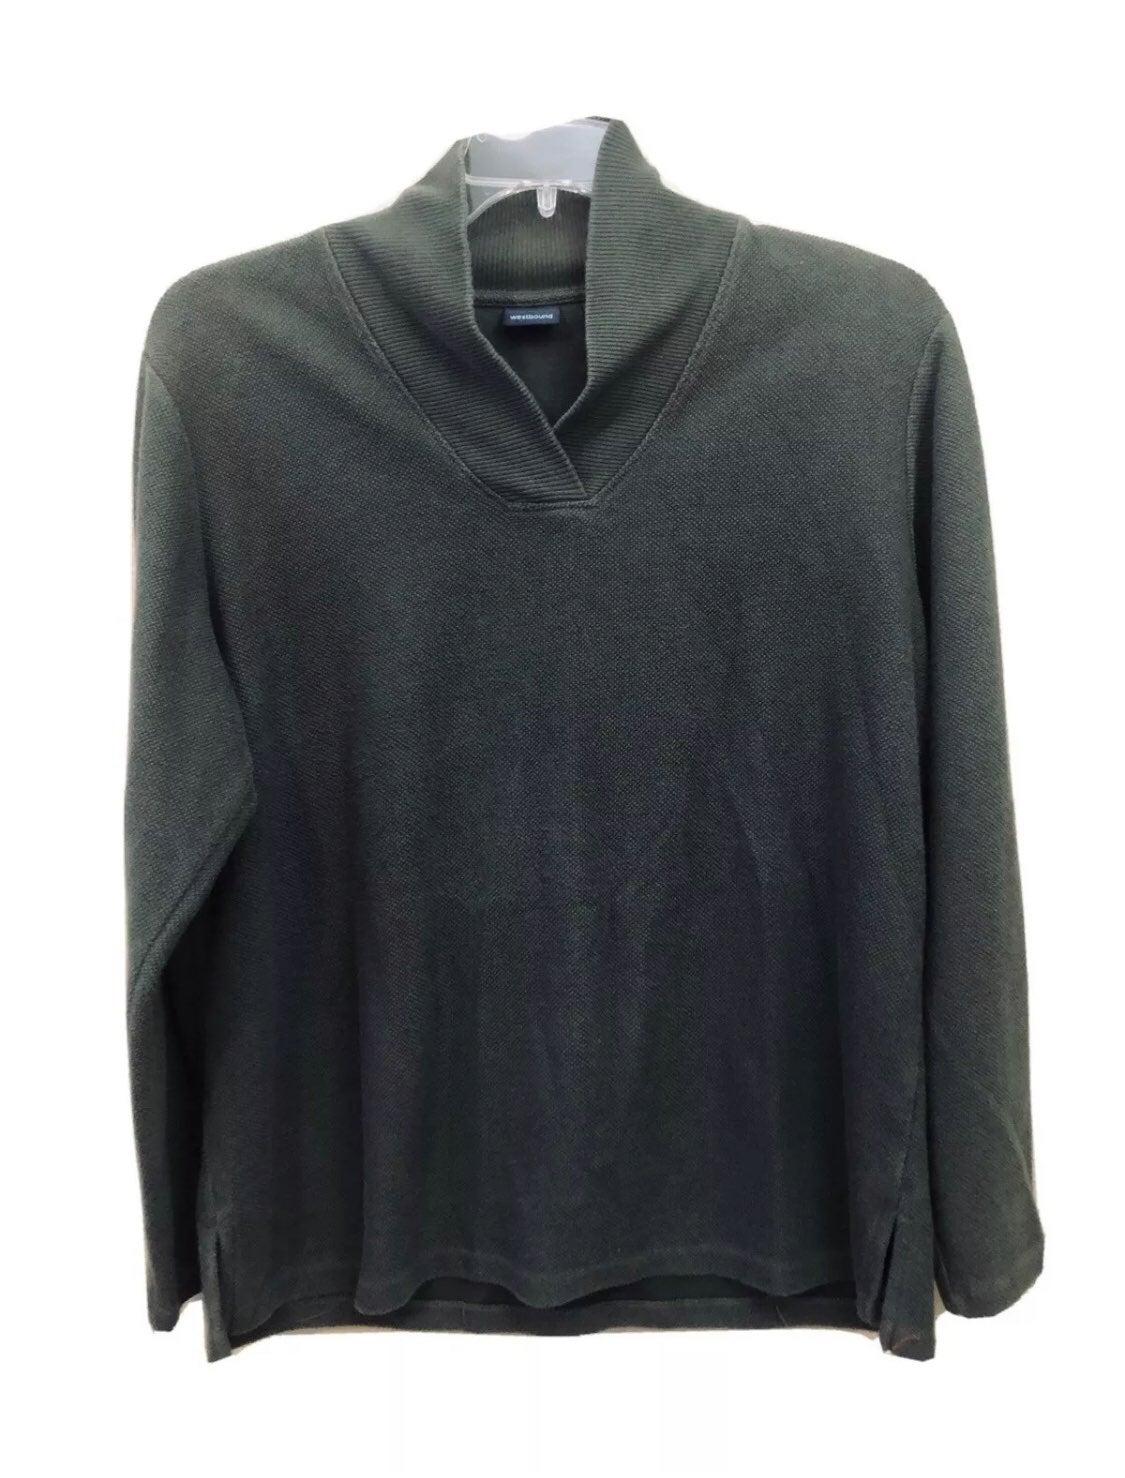 Women's Westbound Green L/S Pullover XL